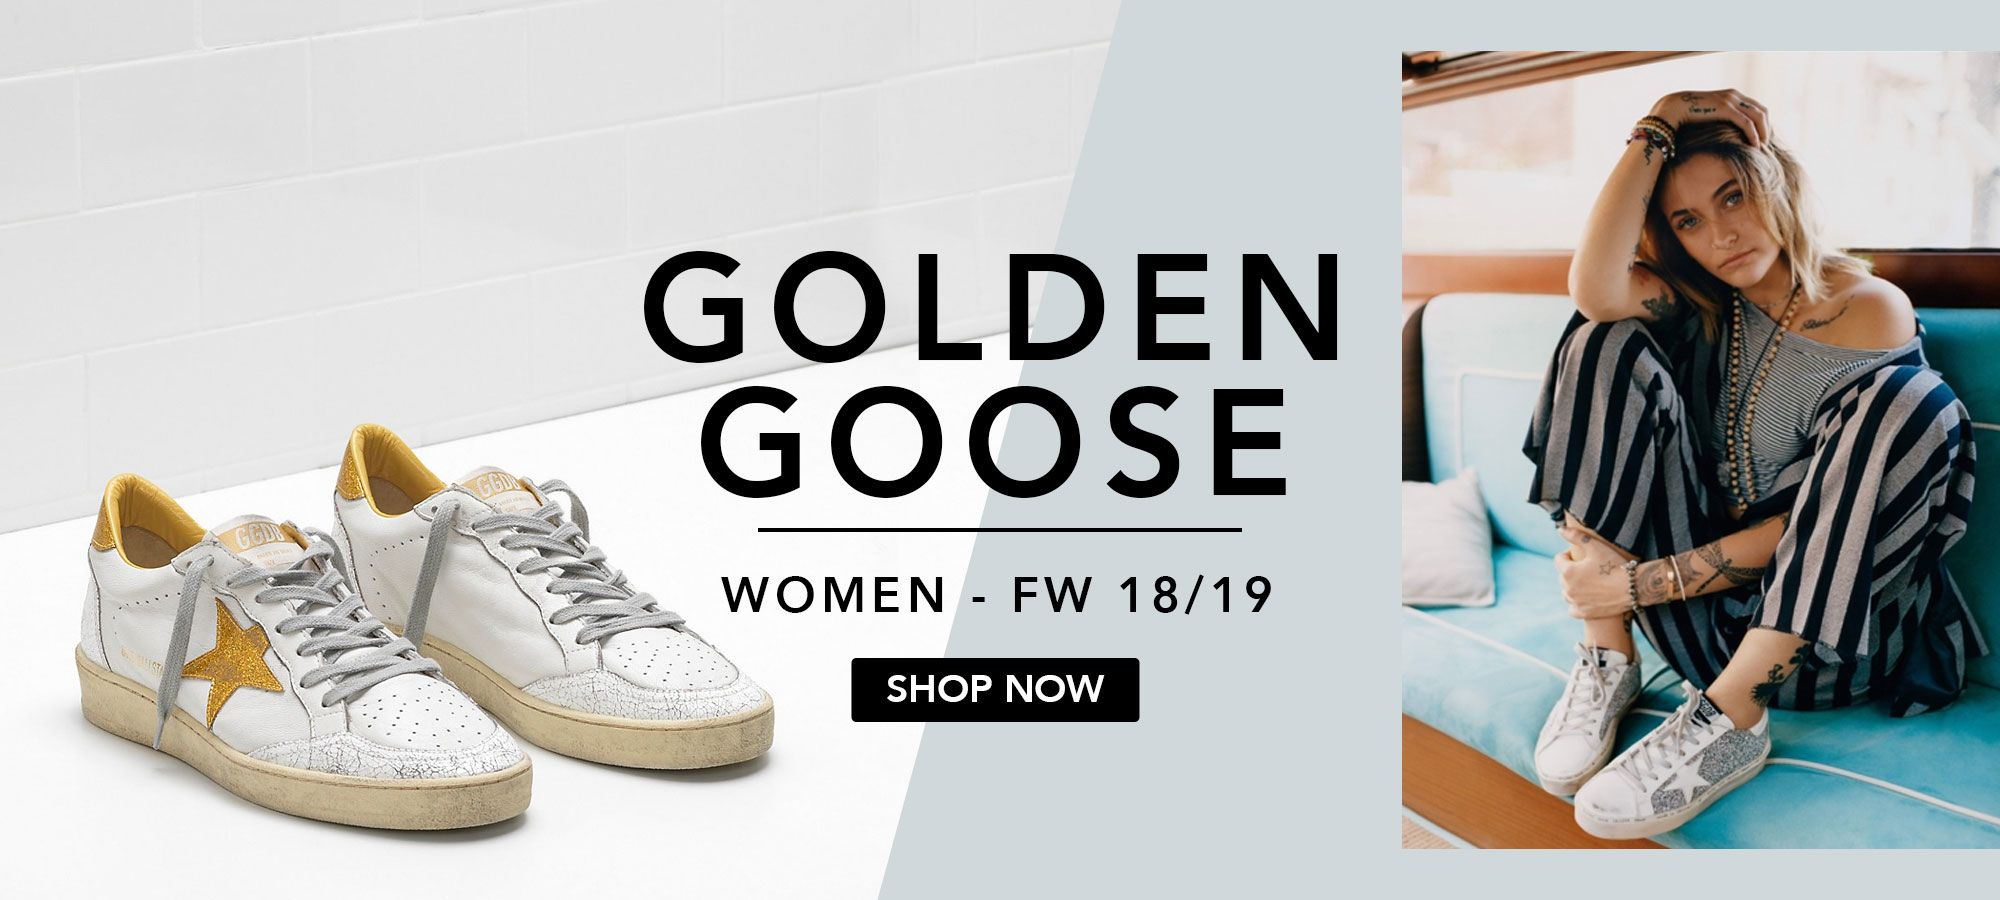 Golden Goose Women - Fall Winter 2018-2019 by italist